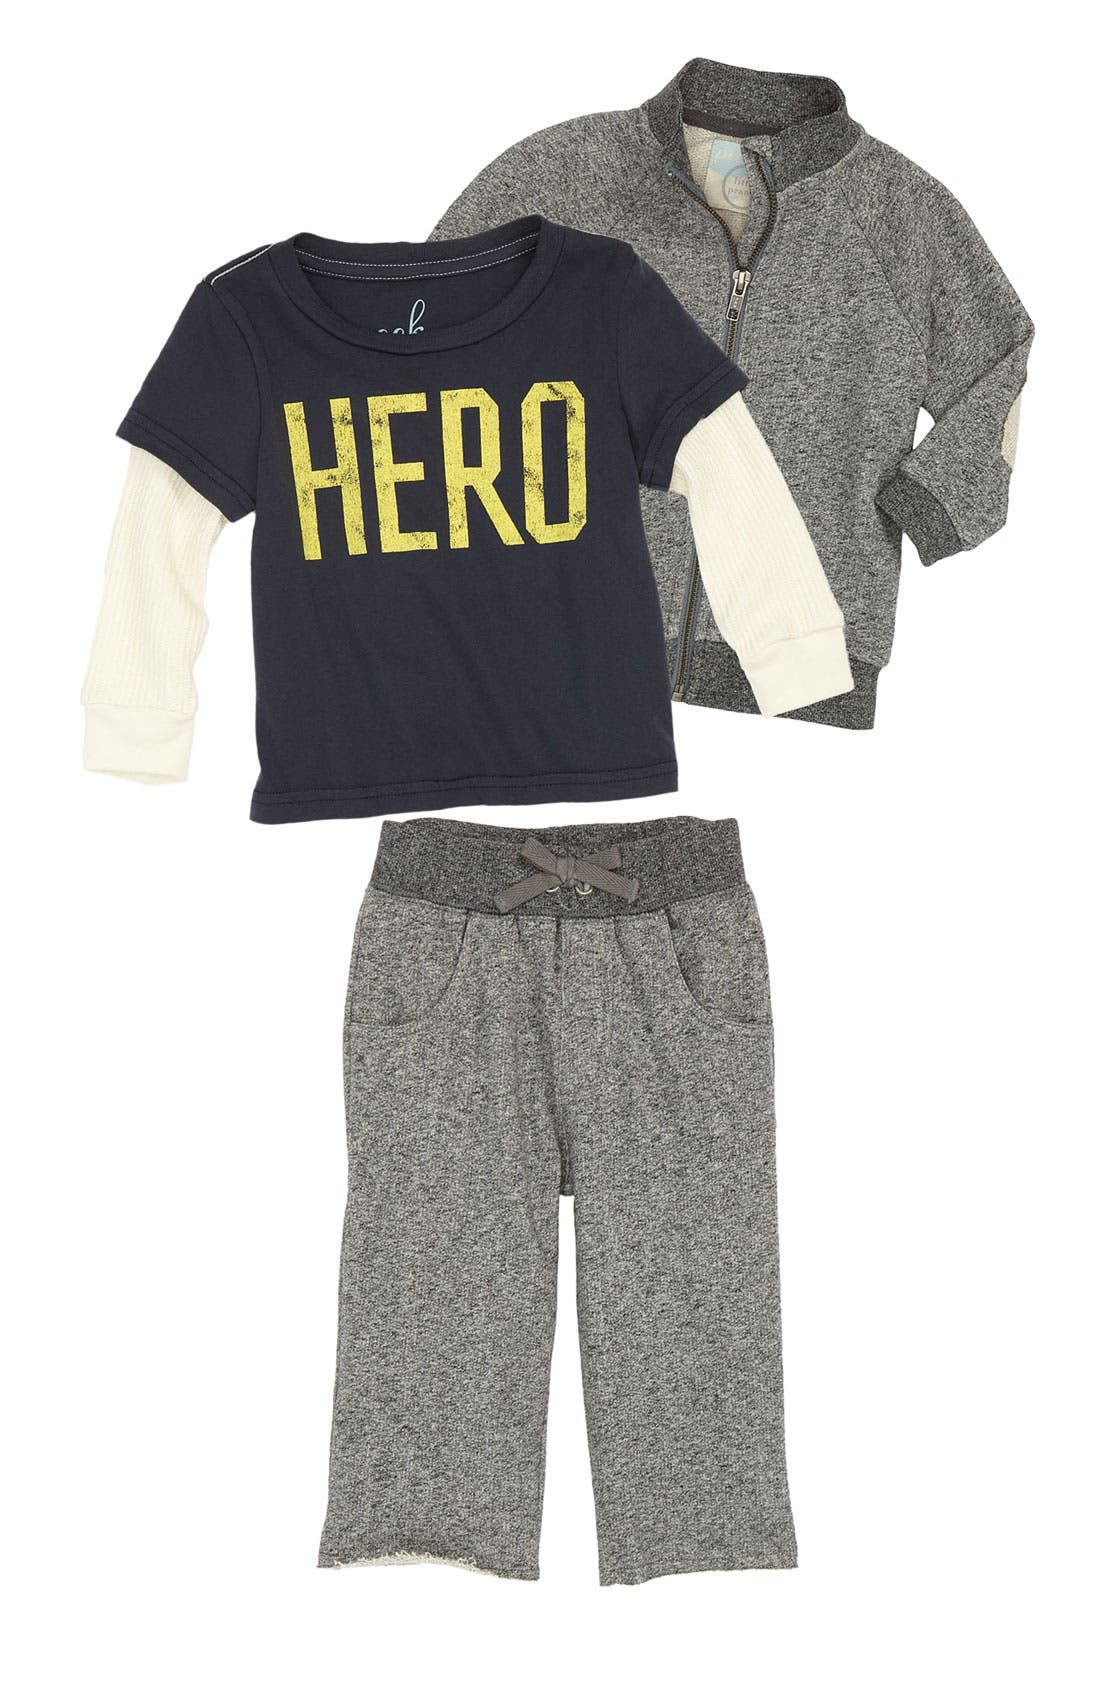 Alternate Image 1 Selected - Peek Sweater, Tee & Pants (Infant)